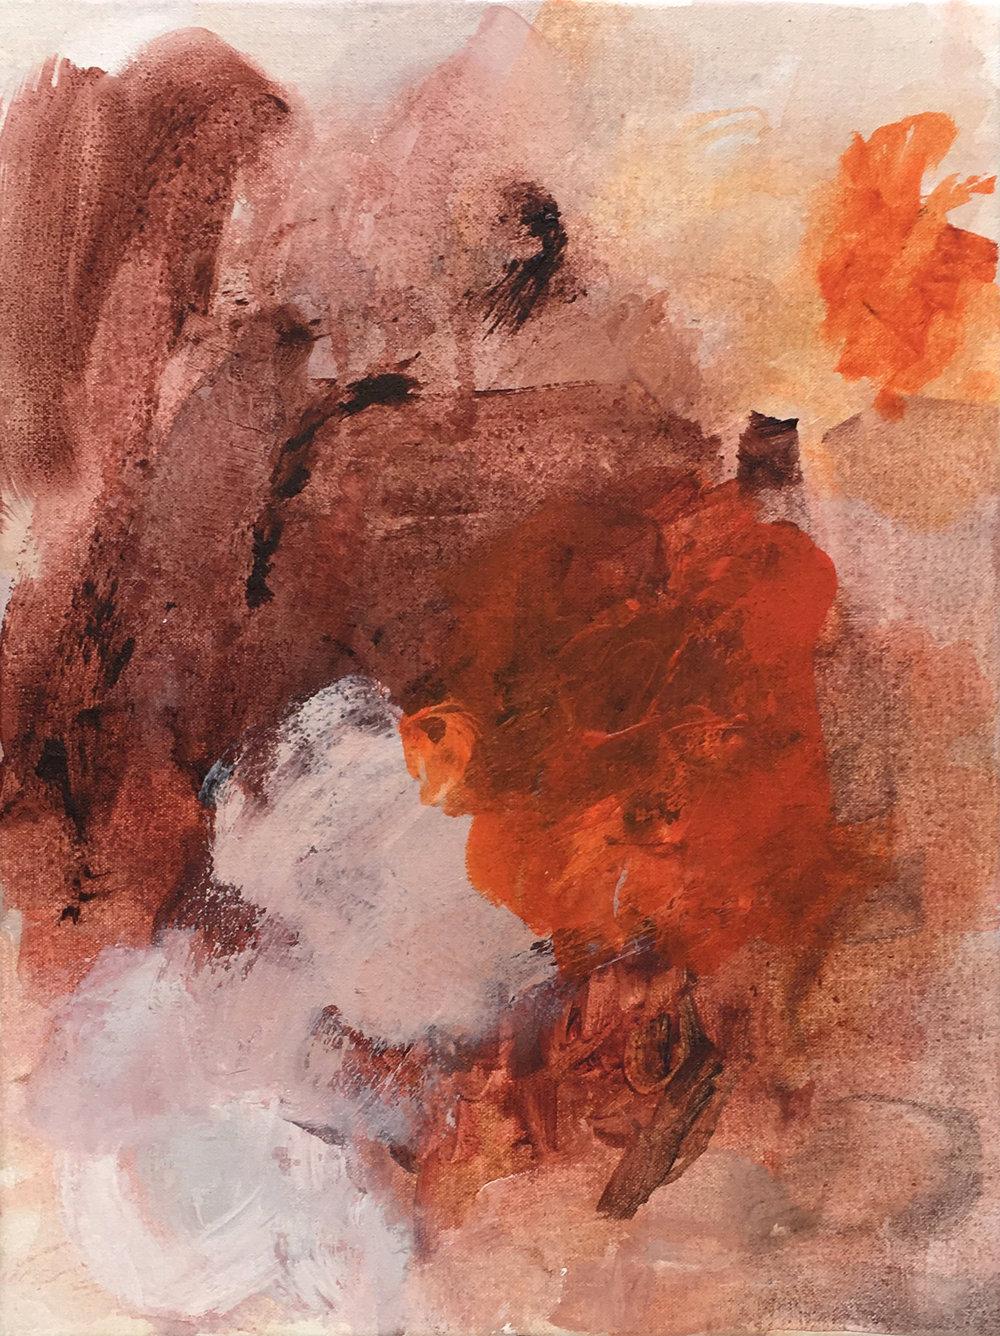 "Relics , acrylic on canvas, 12x 16"", 2018"